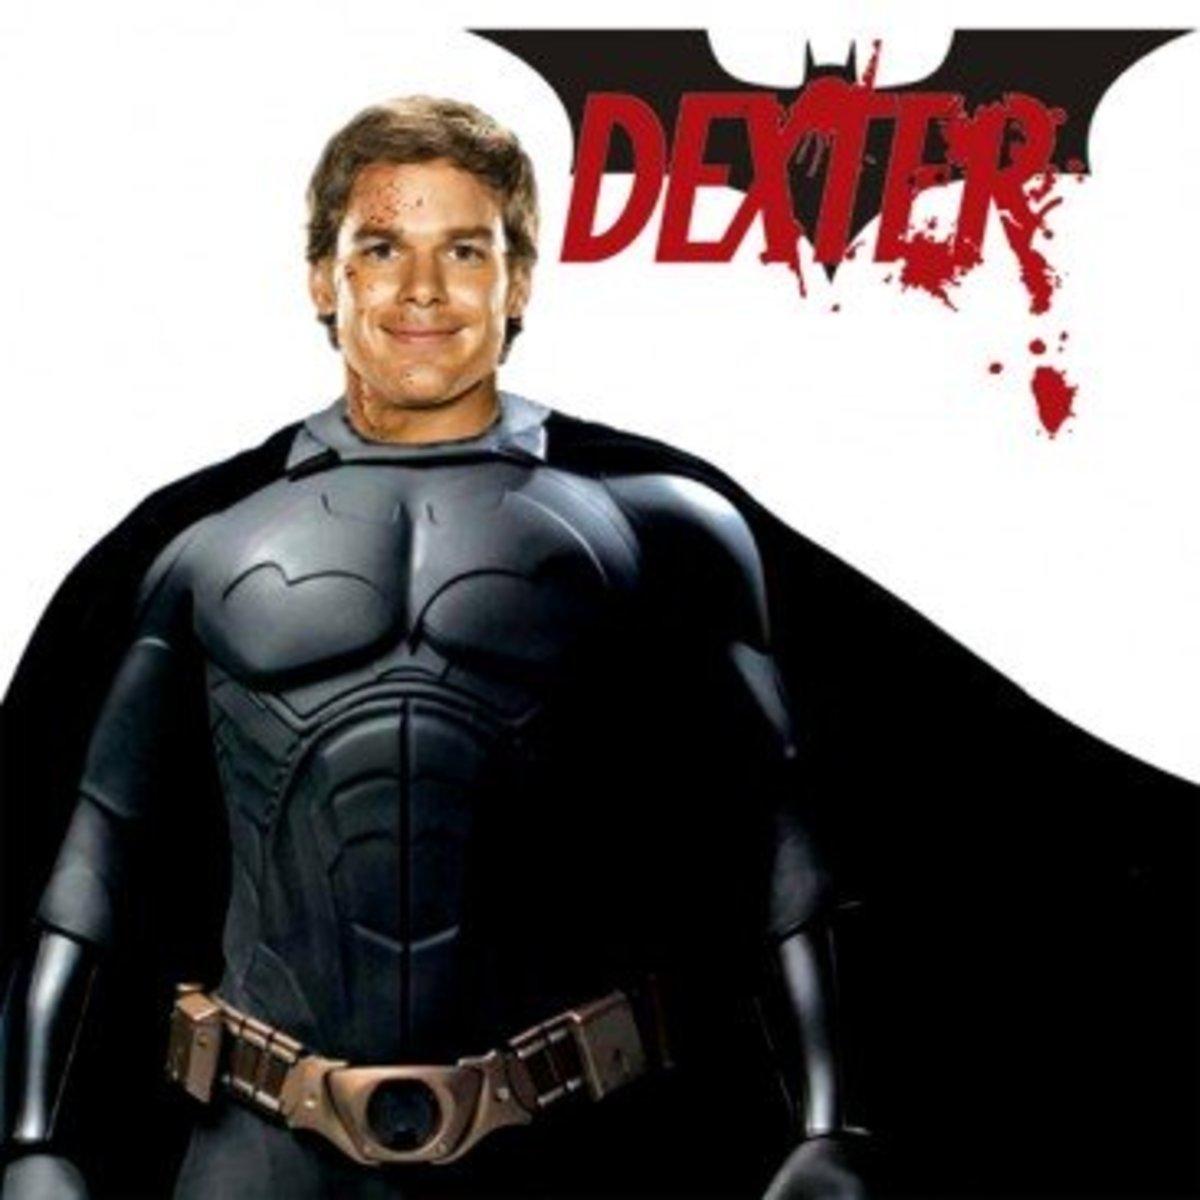 Dexter: An Autism Spectrum Superhero